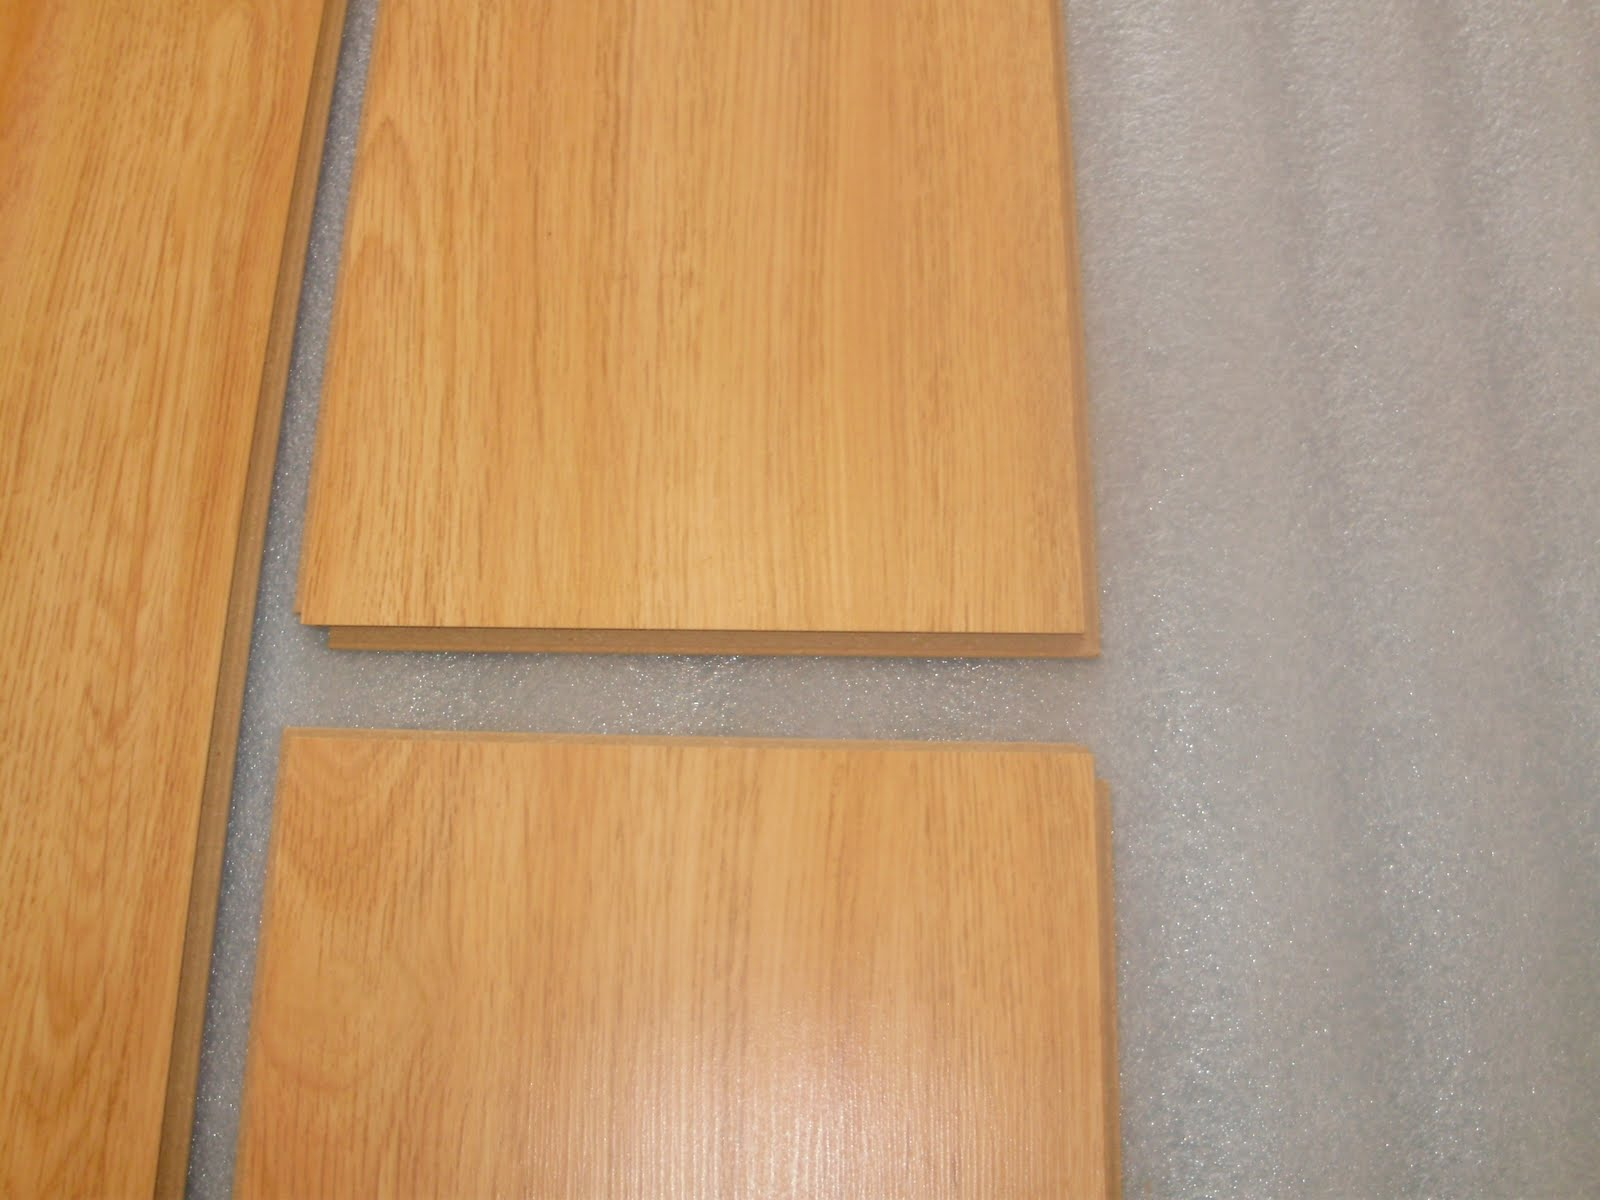 castorama nimes parquet devis artisan caen soci t qjnr. Black Bedroom Furniture Sets. Home Design Ideas